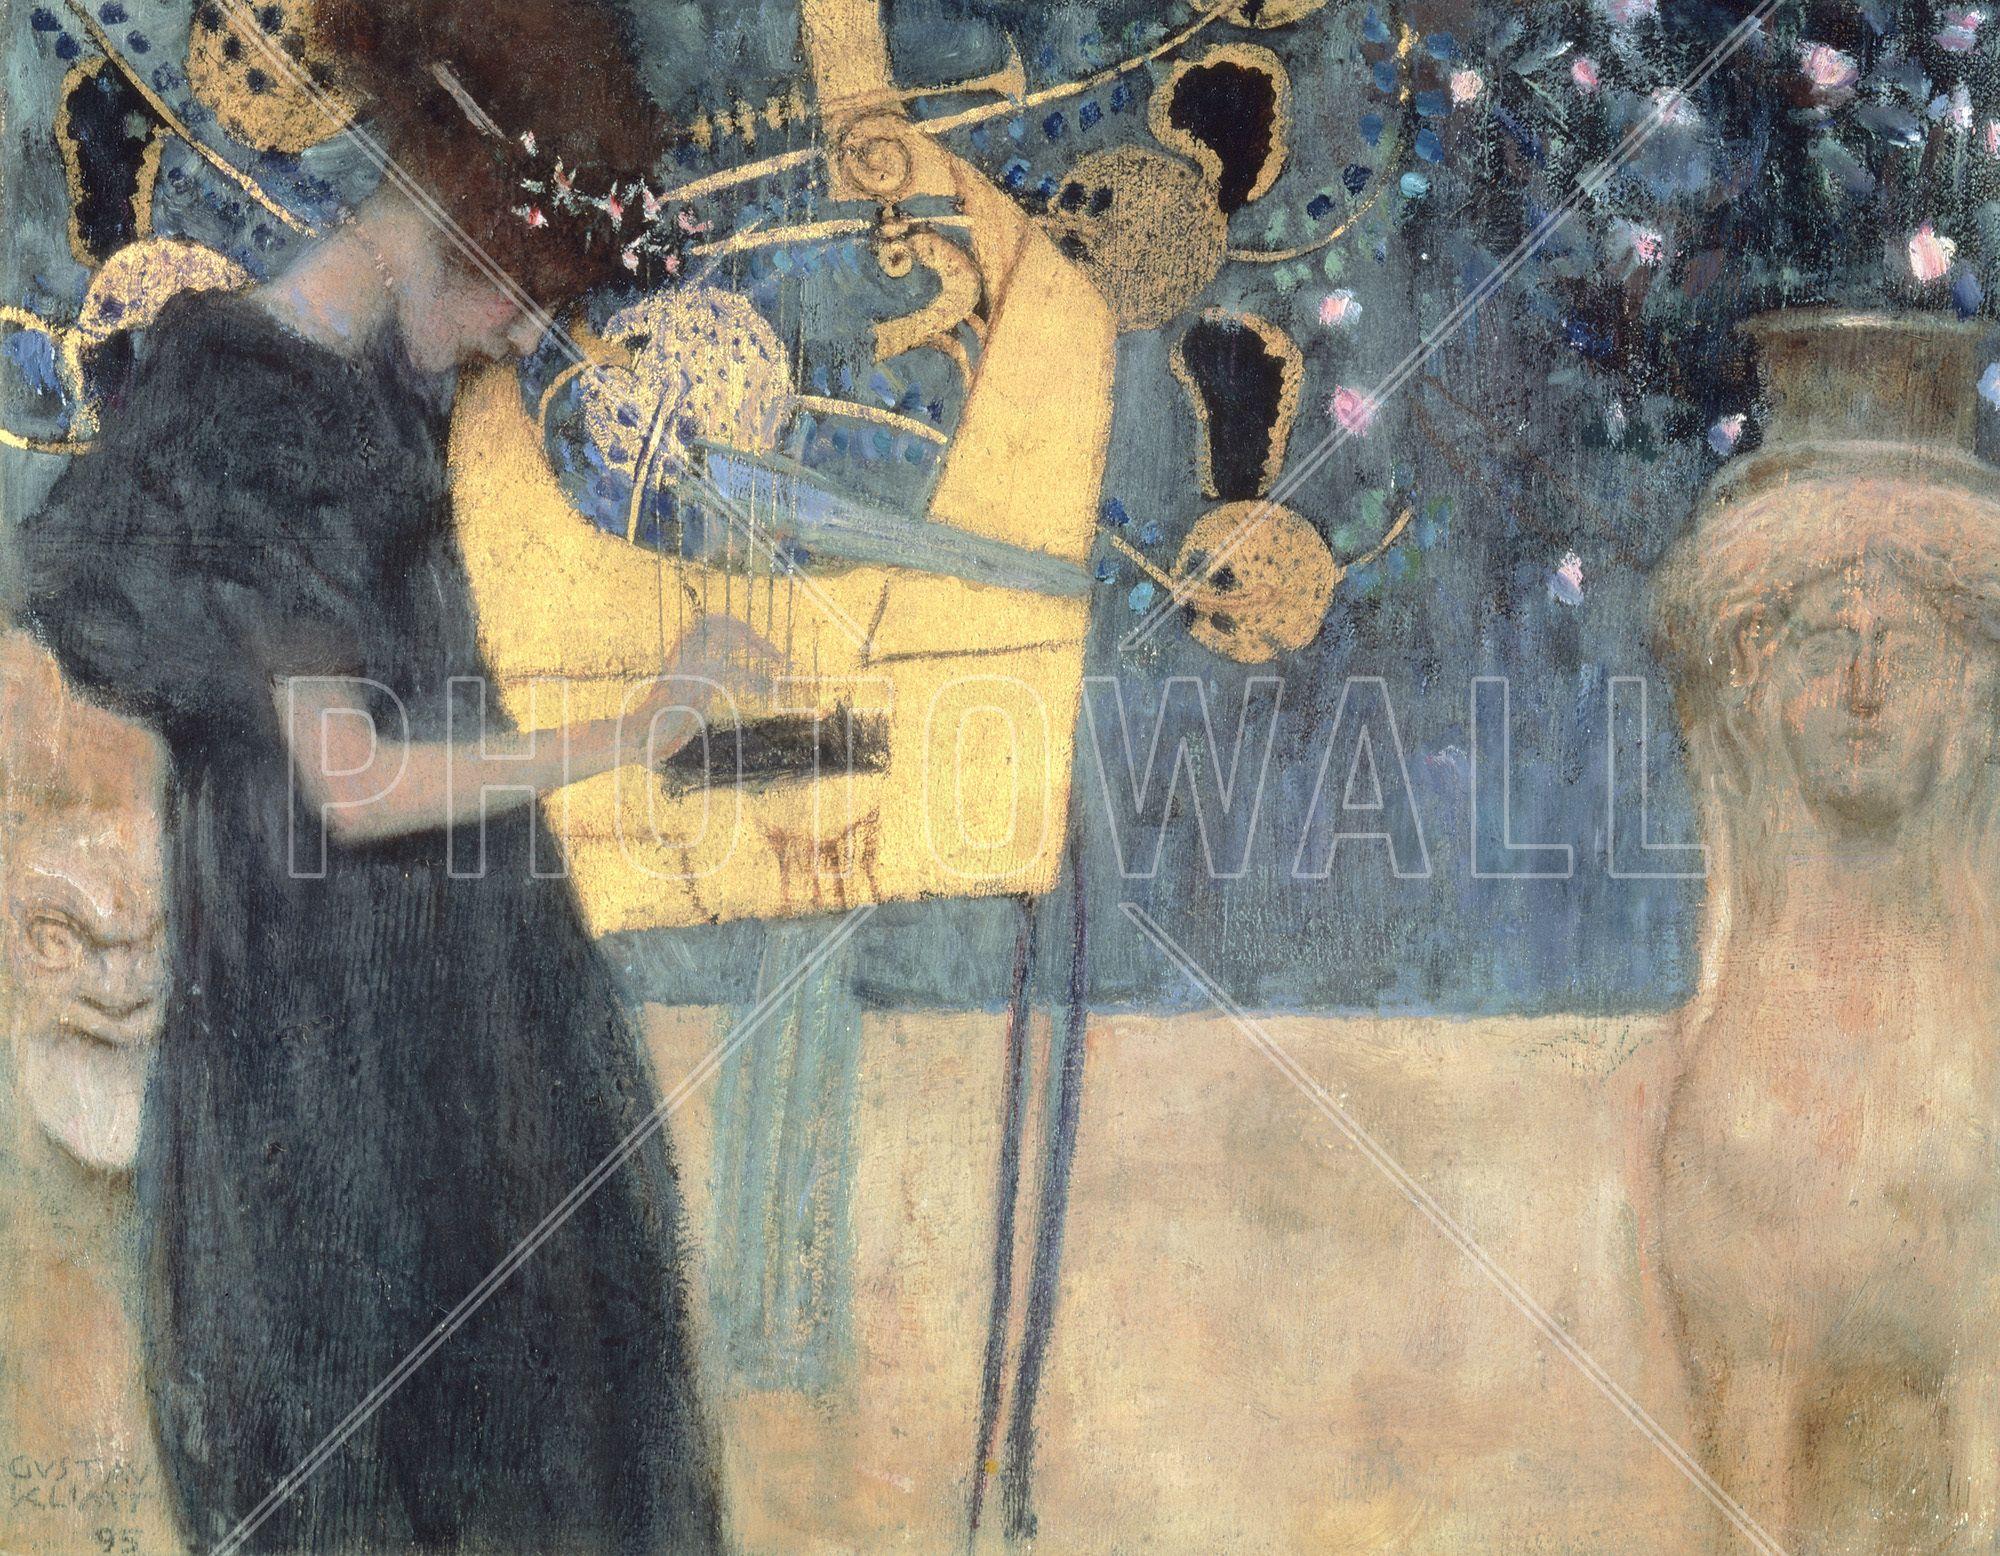 Fantastic Wallpaper Music Painting - d75a1e76d53d90245dfd7820dbeb2b0c  Pictures_918485.jpg